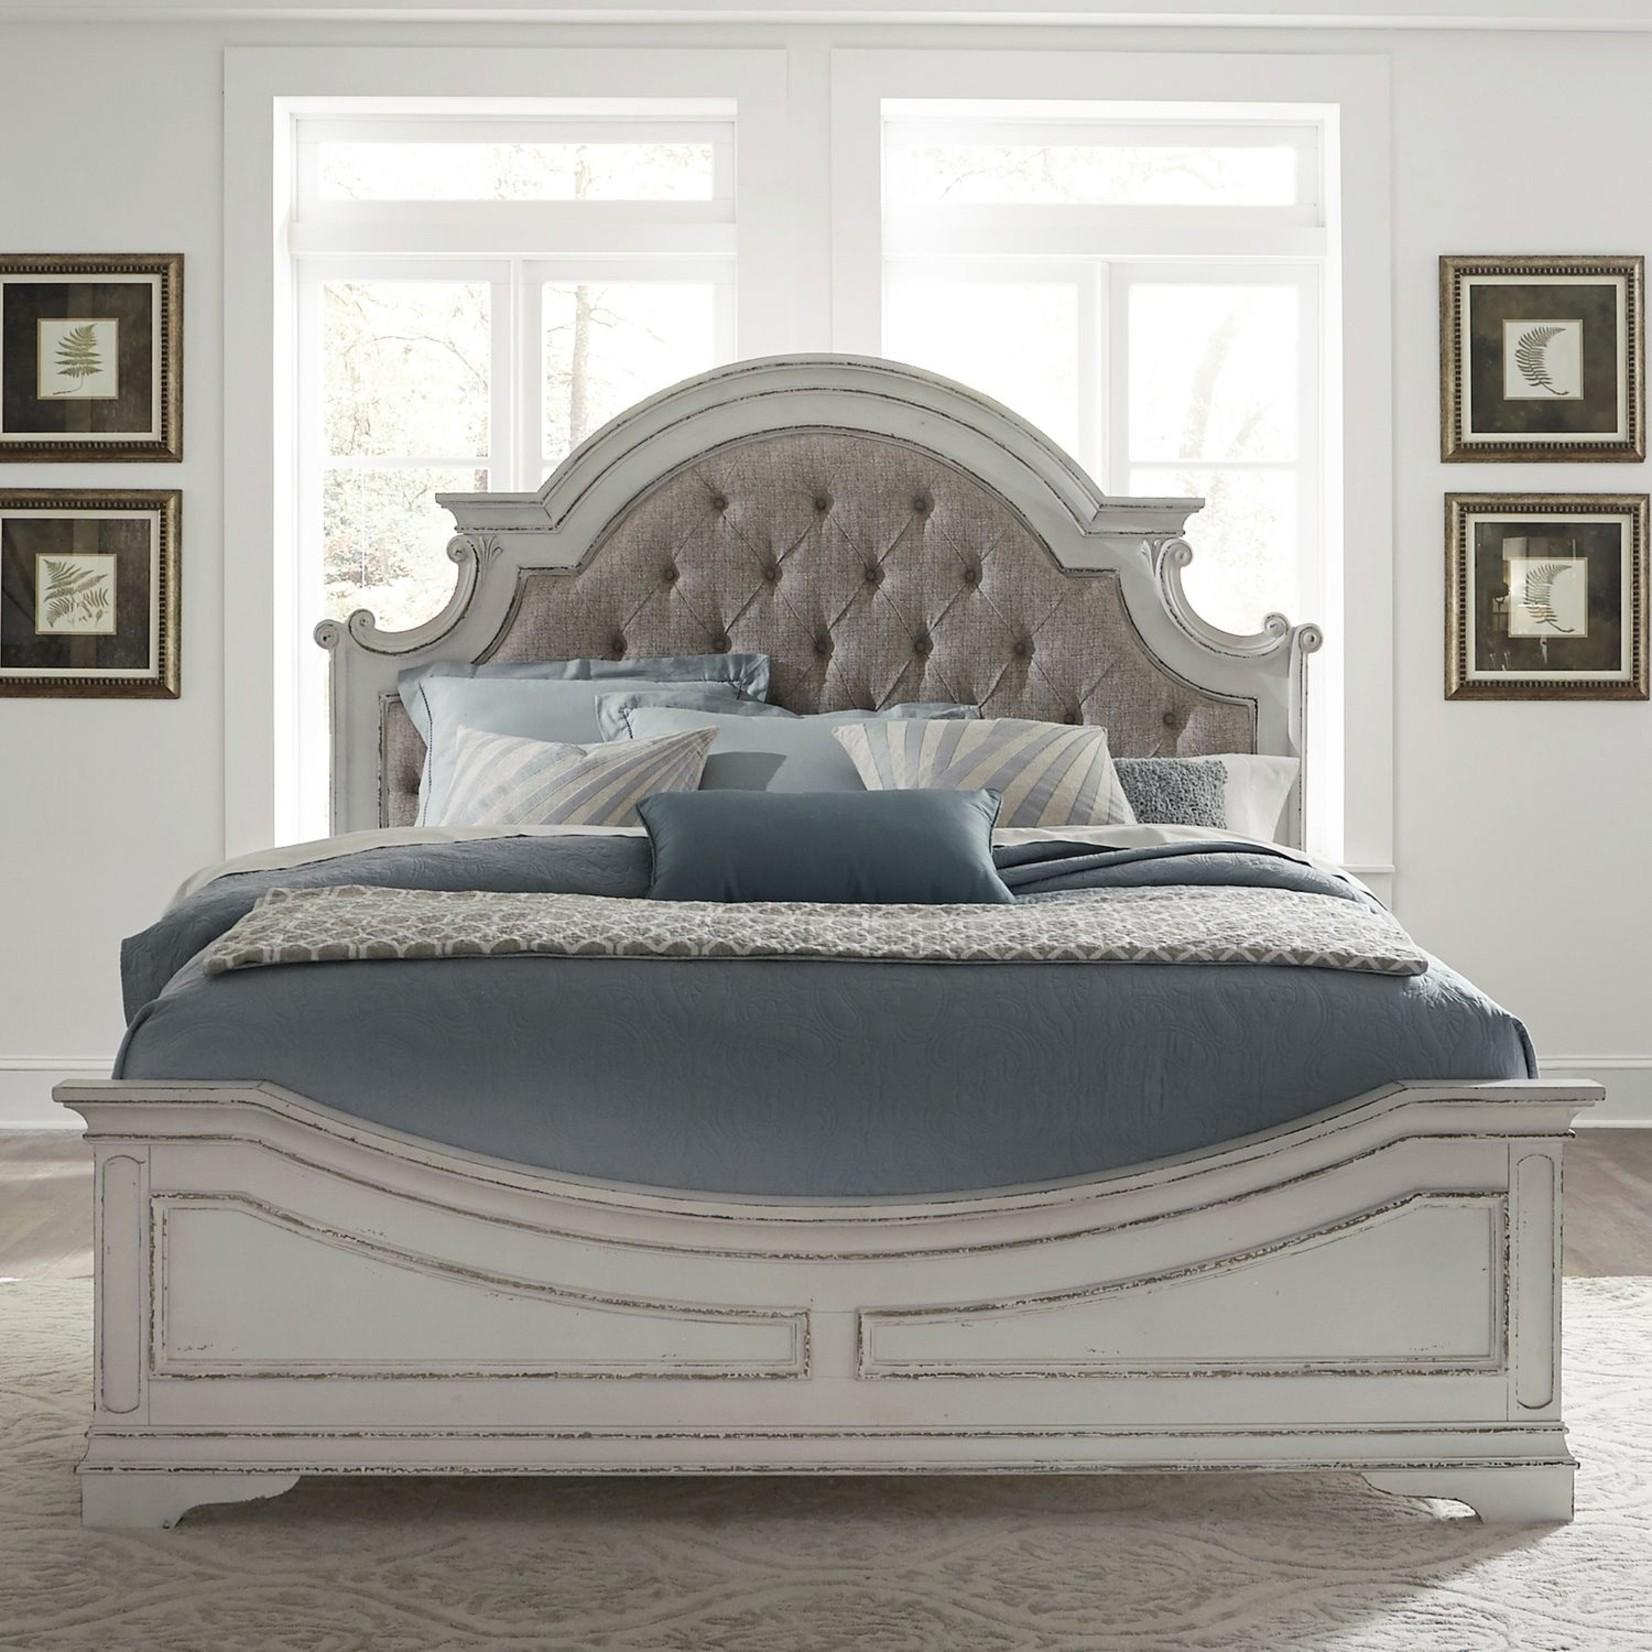 Magnolia Manor Upholstered Queen Bed